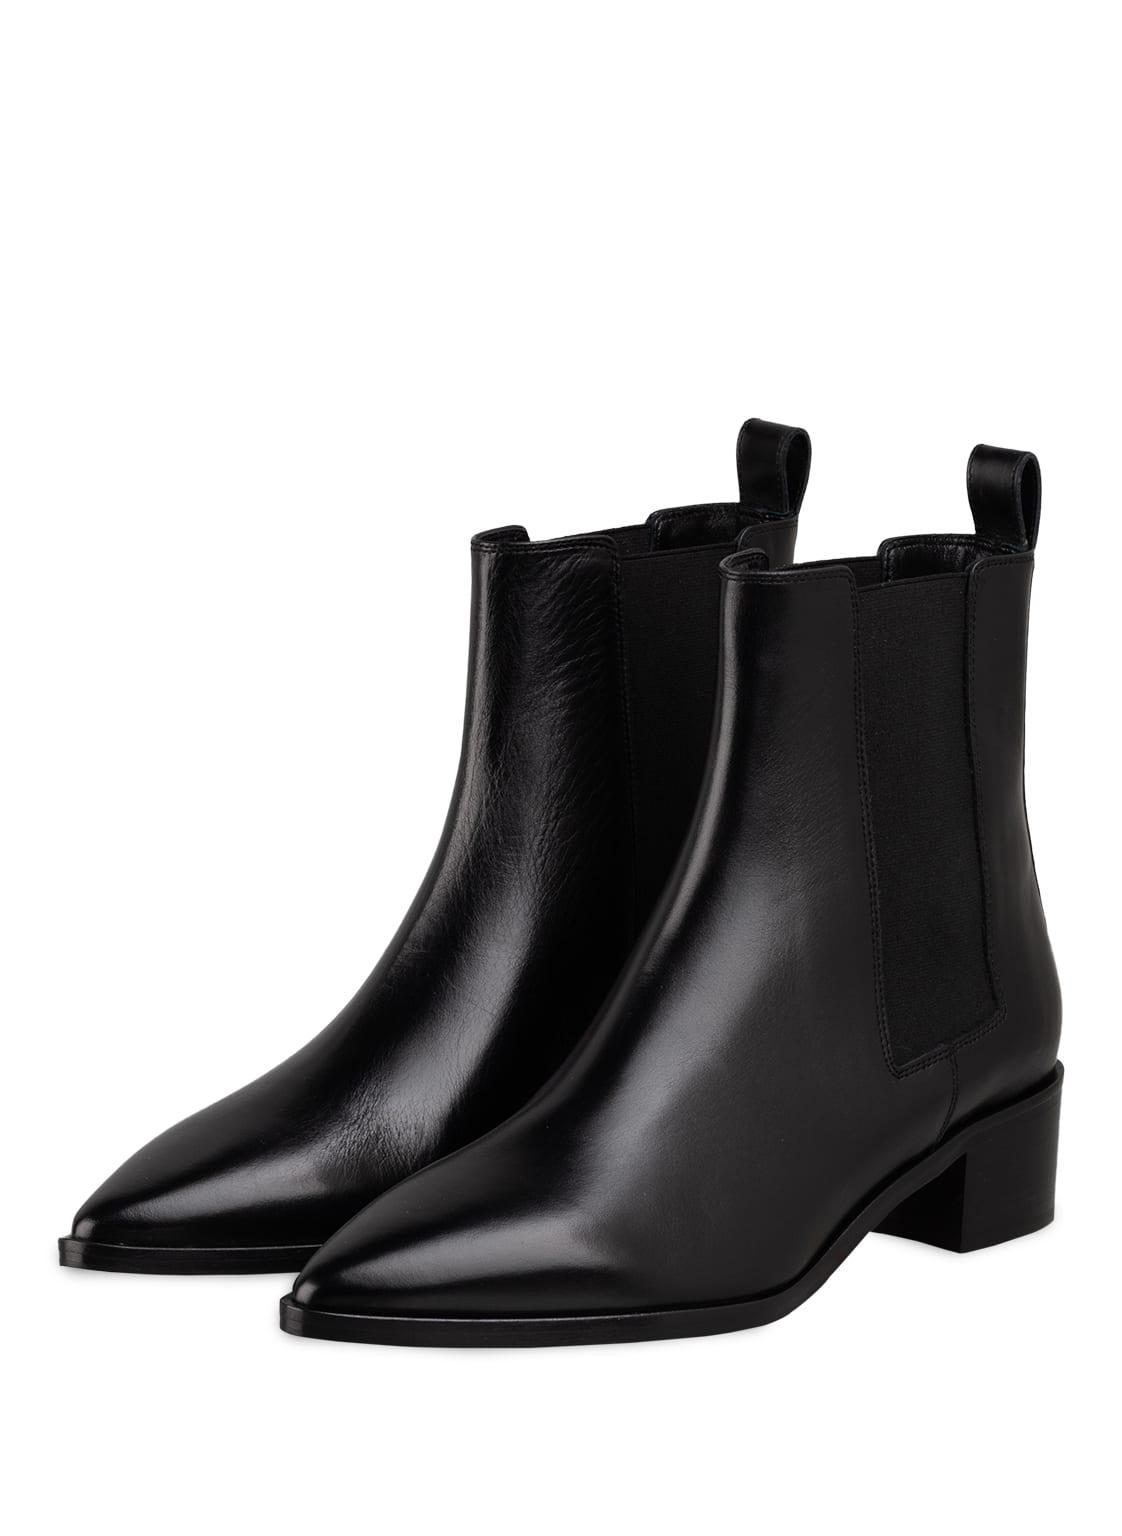 Image of Aeyde Chelsea-Boots schwarz